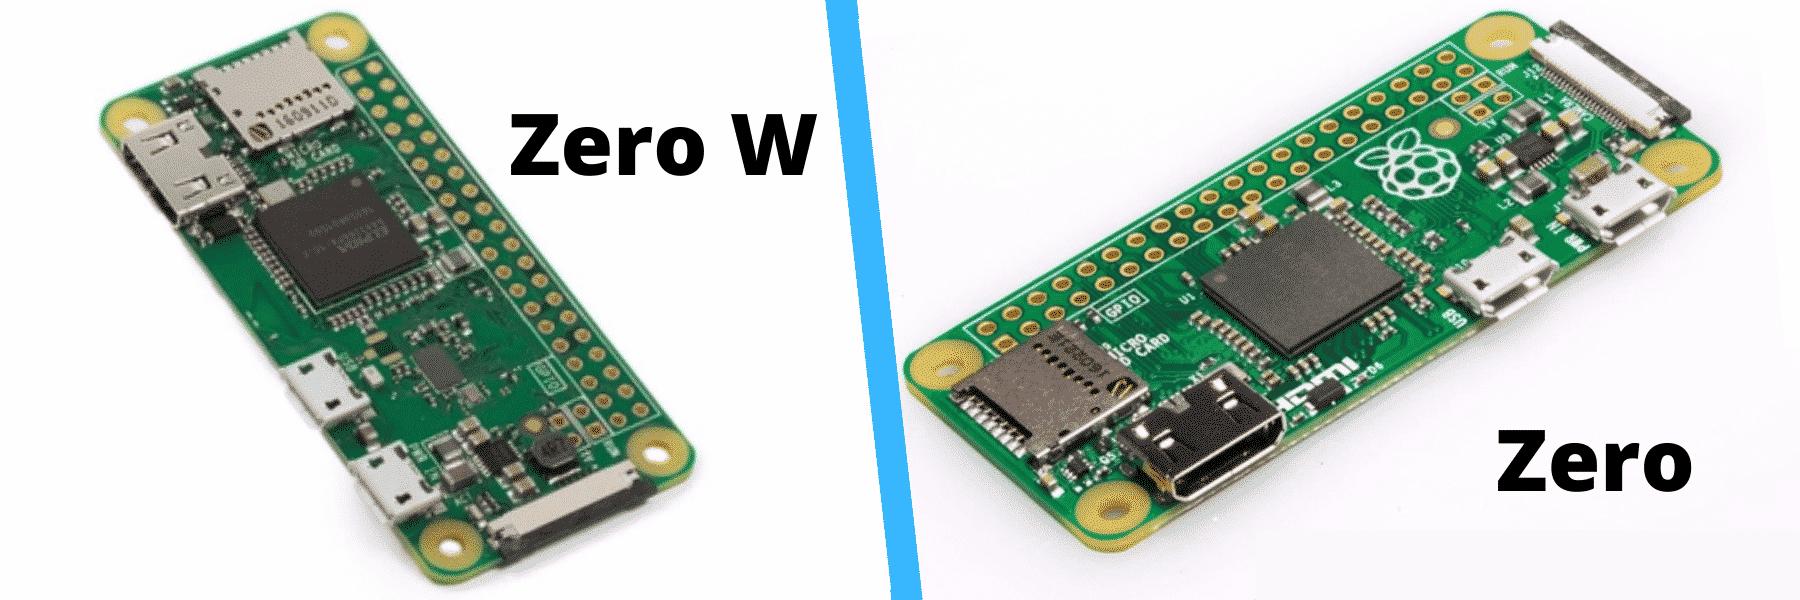 Verschil Raspberry Pi Zero / Zero W